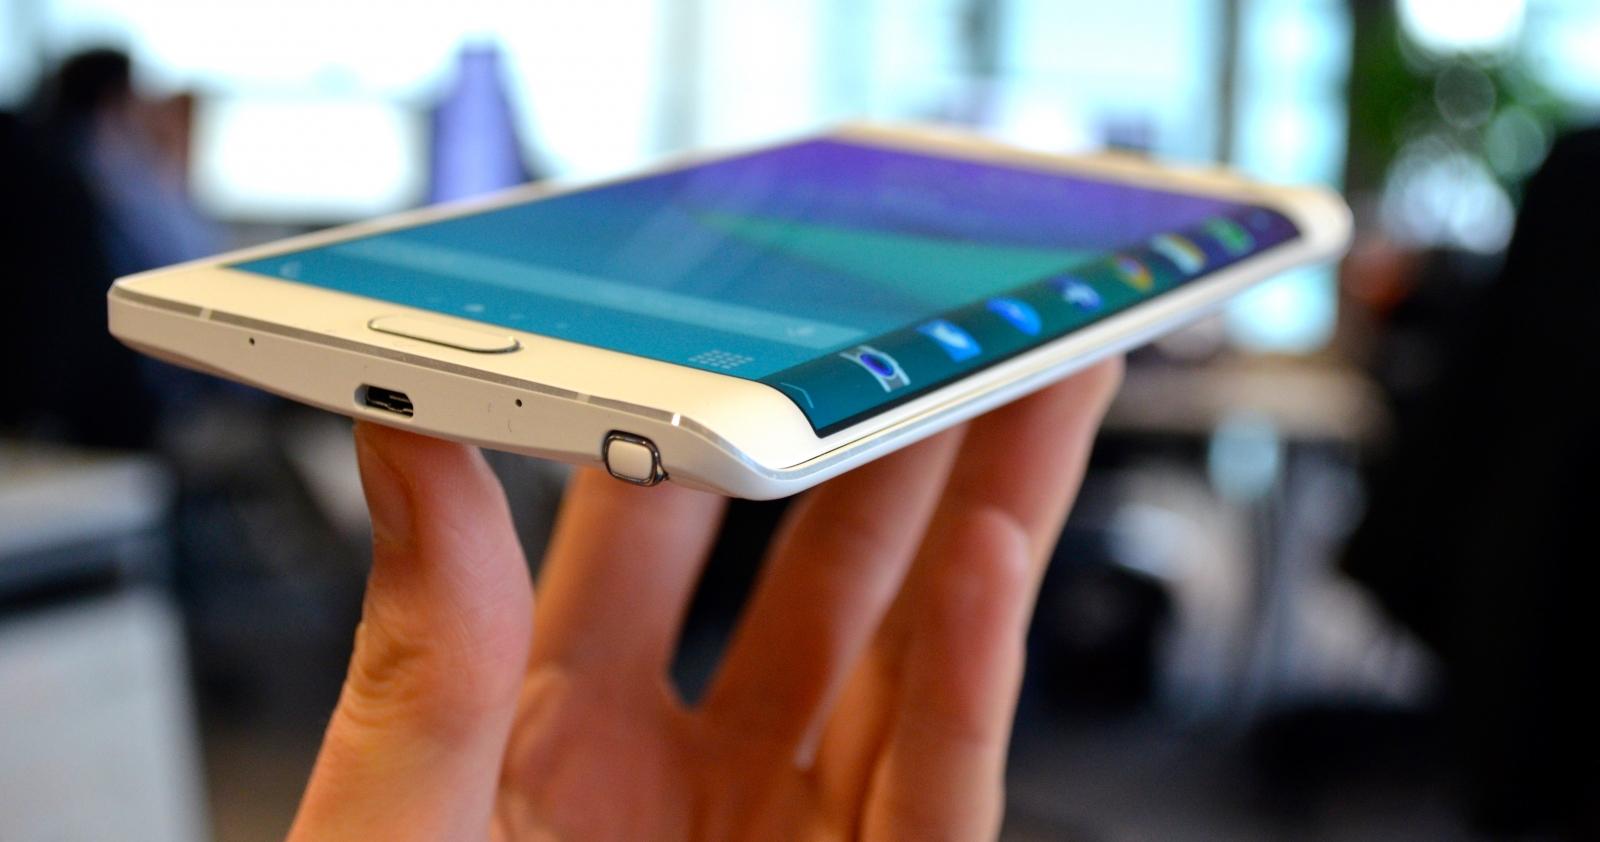 Samsung Galaxy Note 4 Edge